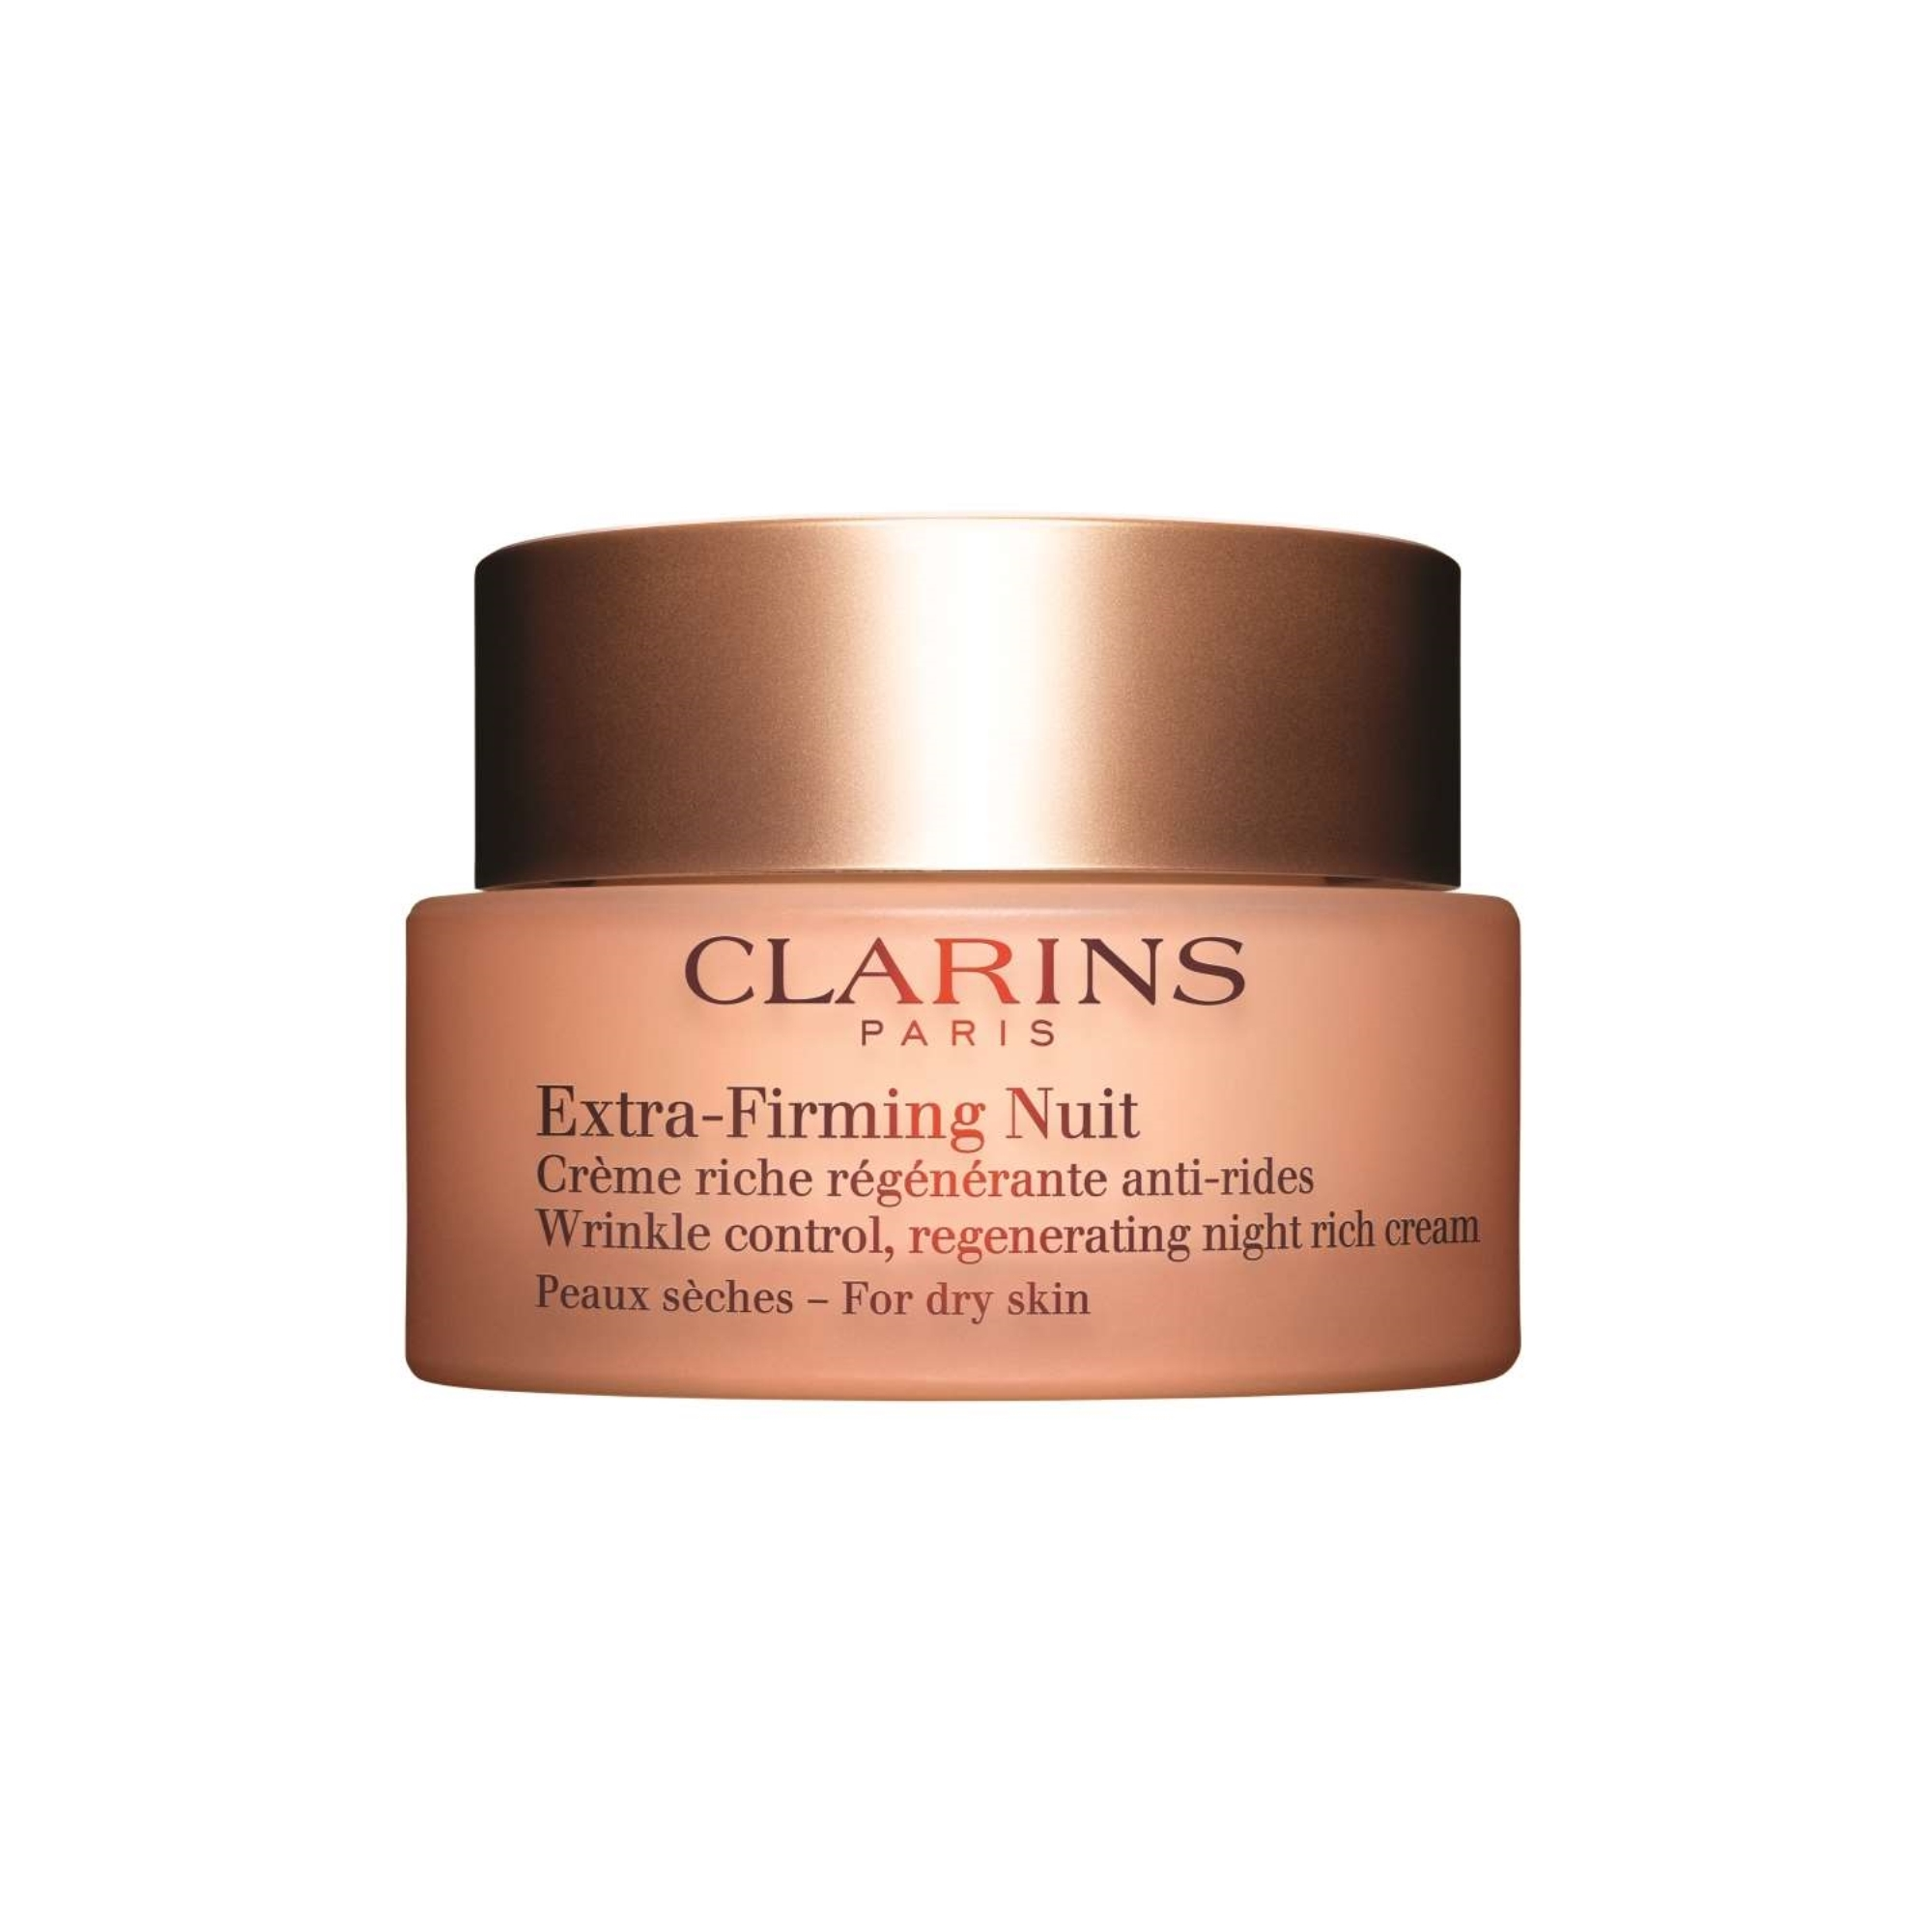 Extra-Firming Night Cream Nuit Dry Skin 50ml